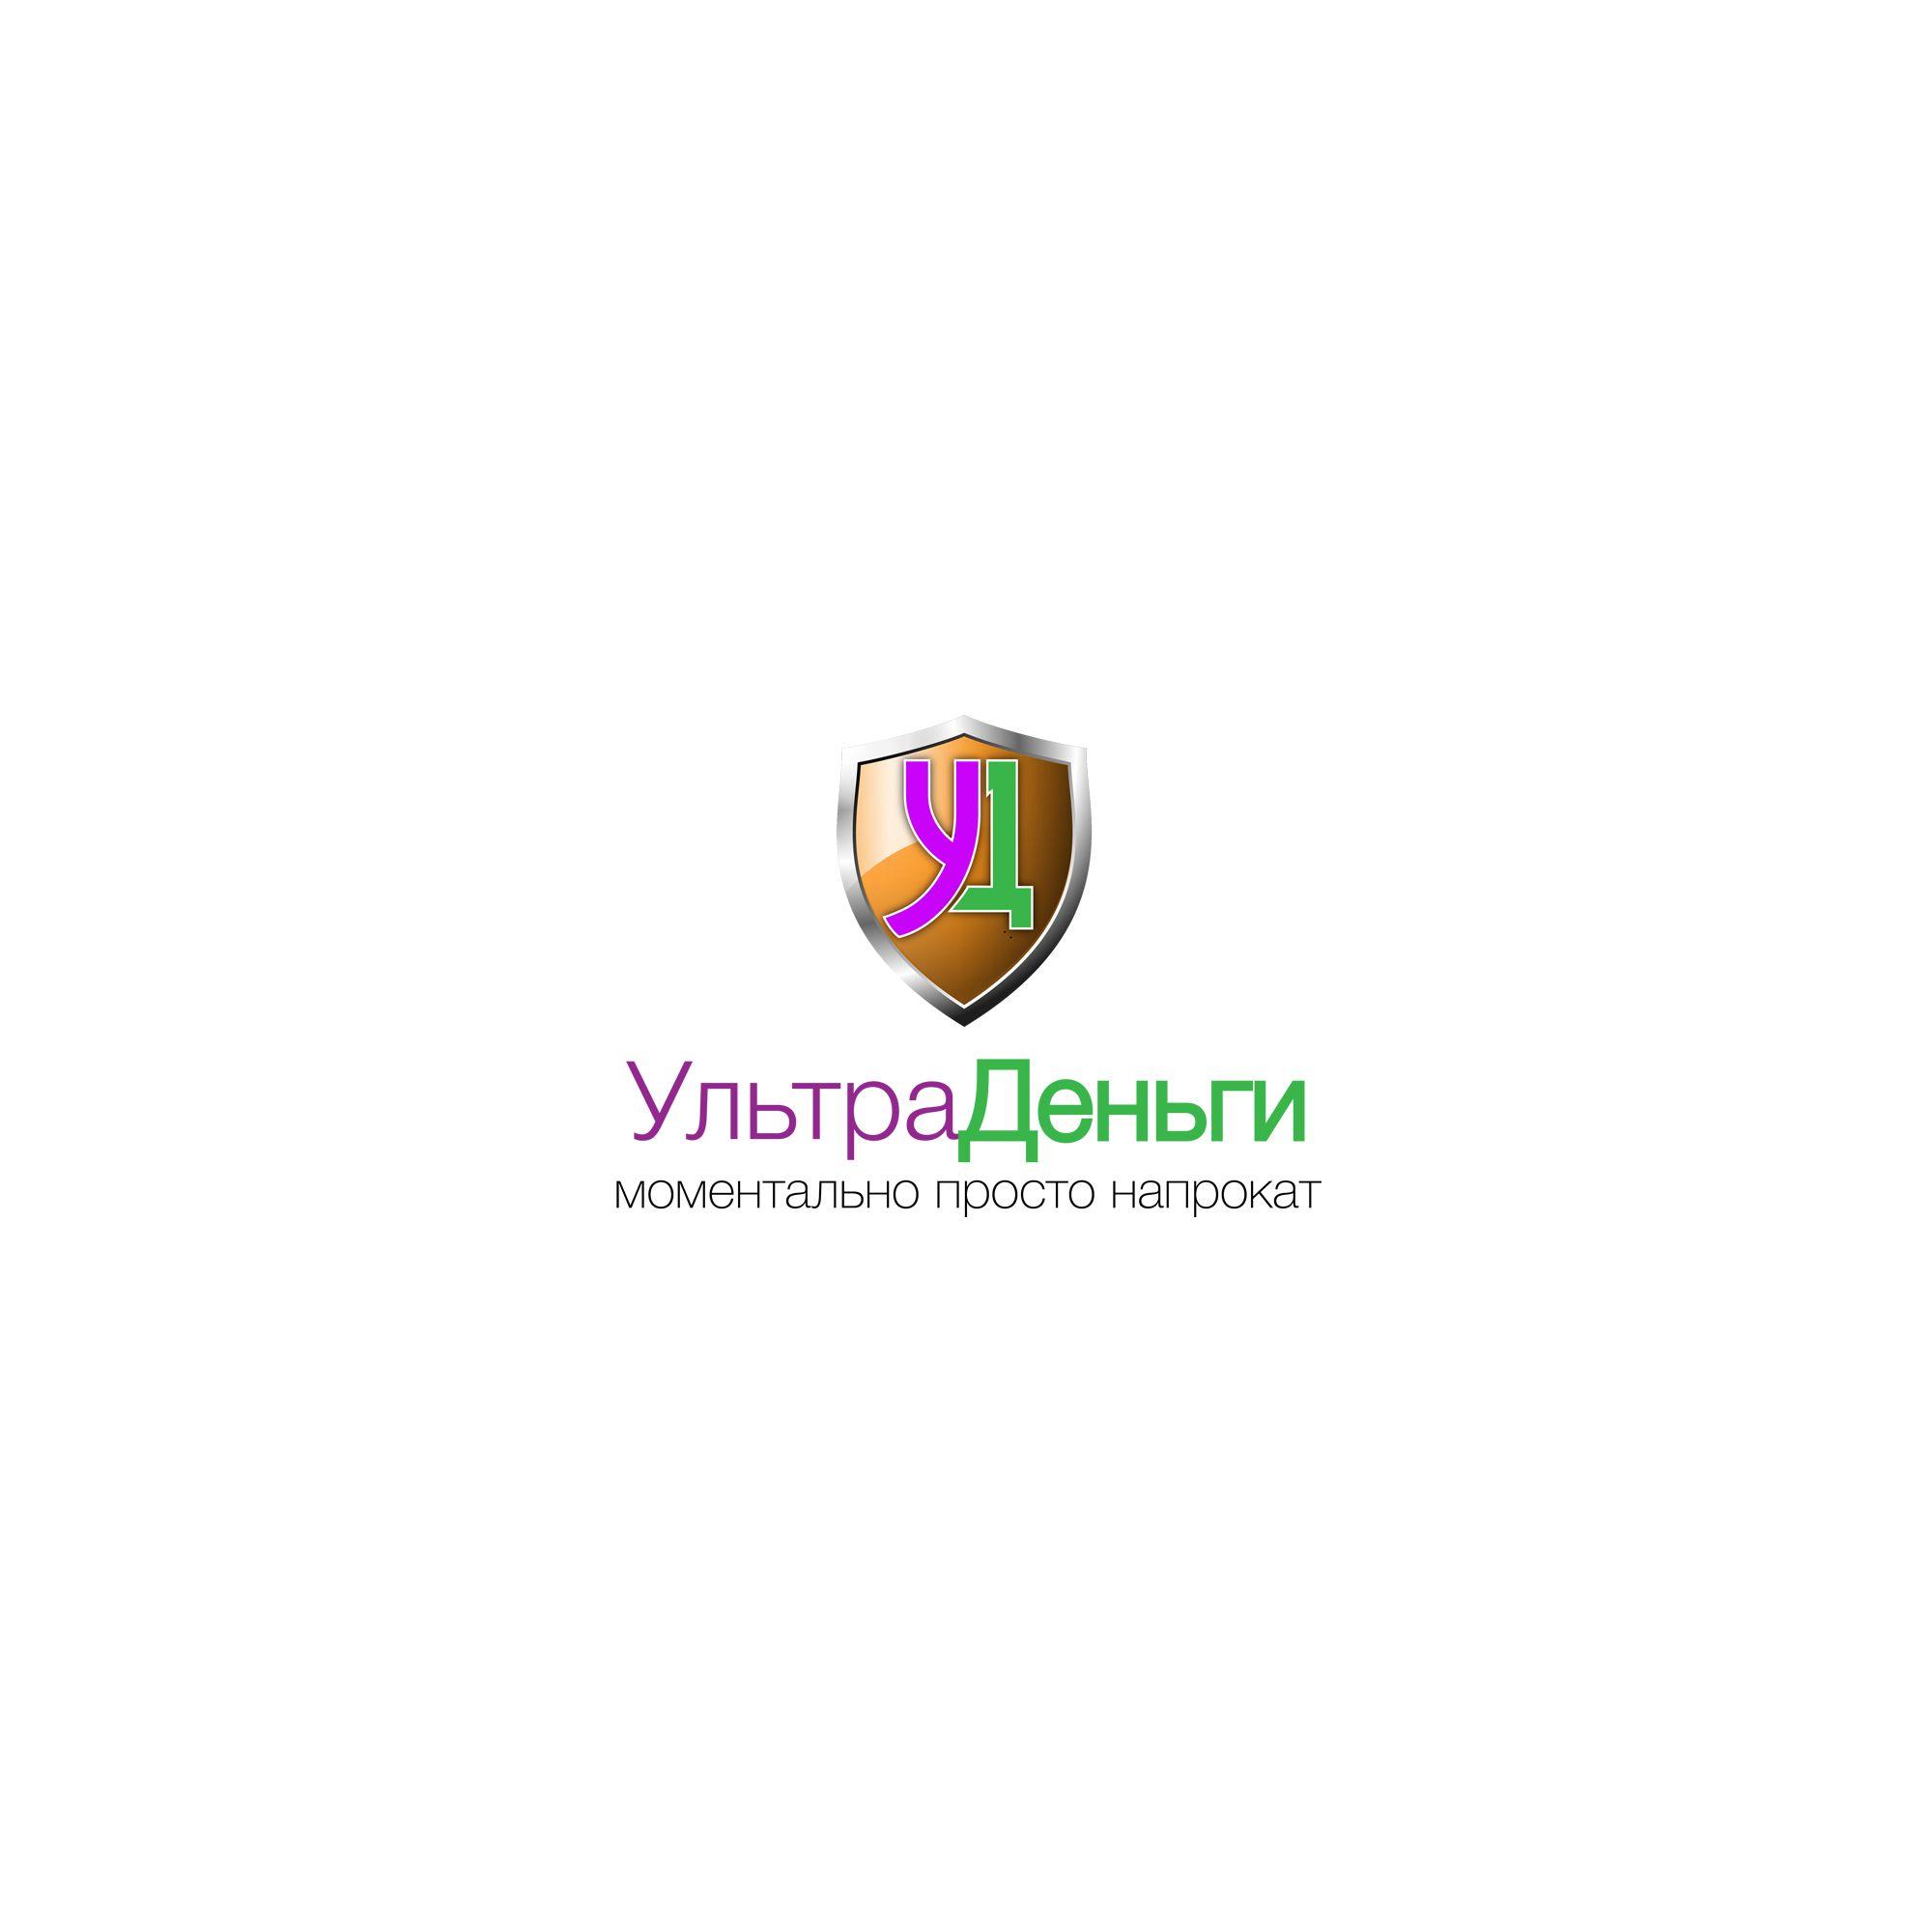 Логотип для сайта МФО ultra-dengi.ru - дизайнер atmannn